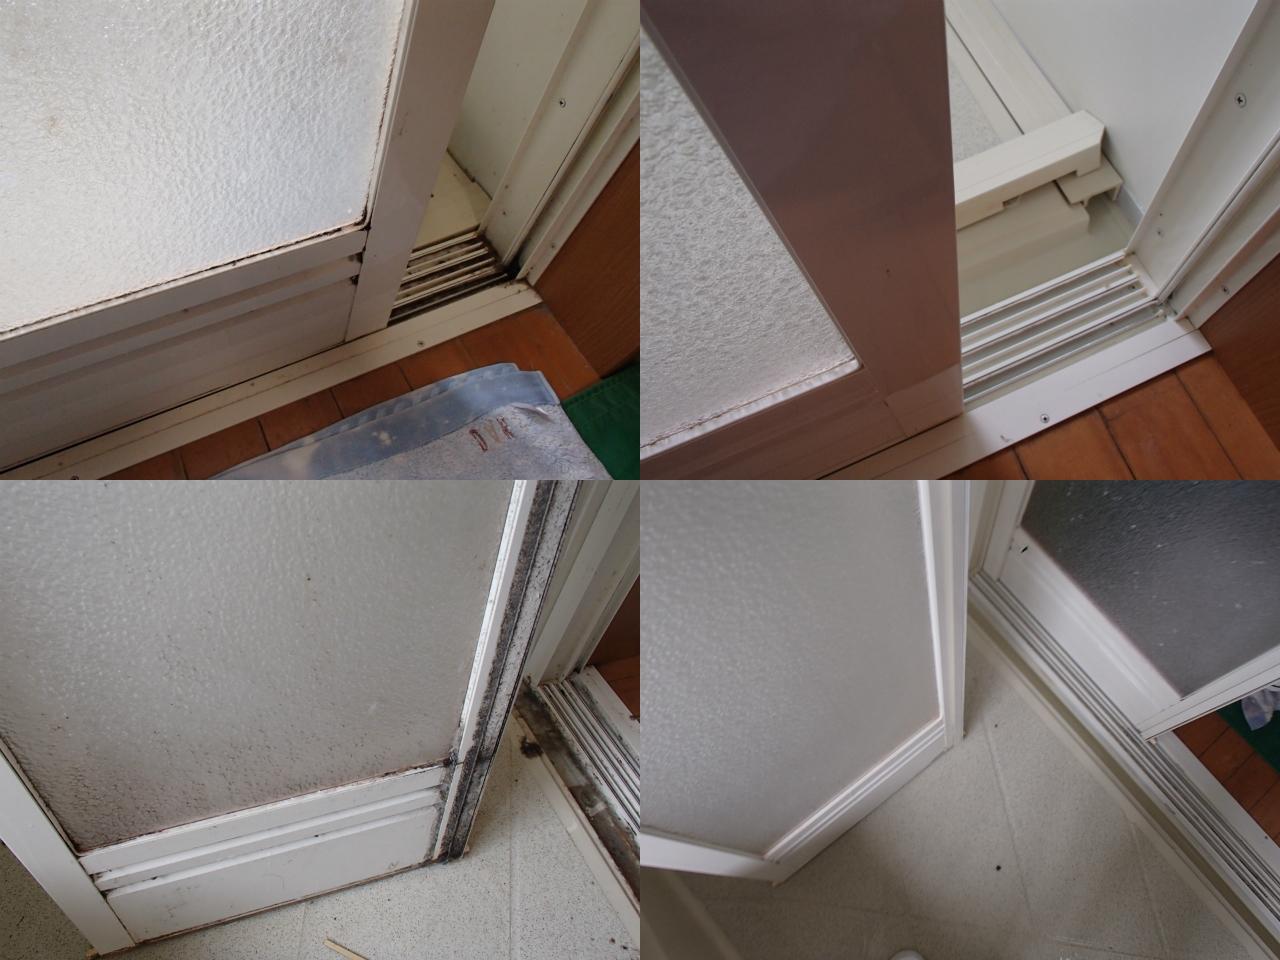 http://ajras.net/images/130424-bathroom1.jpg